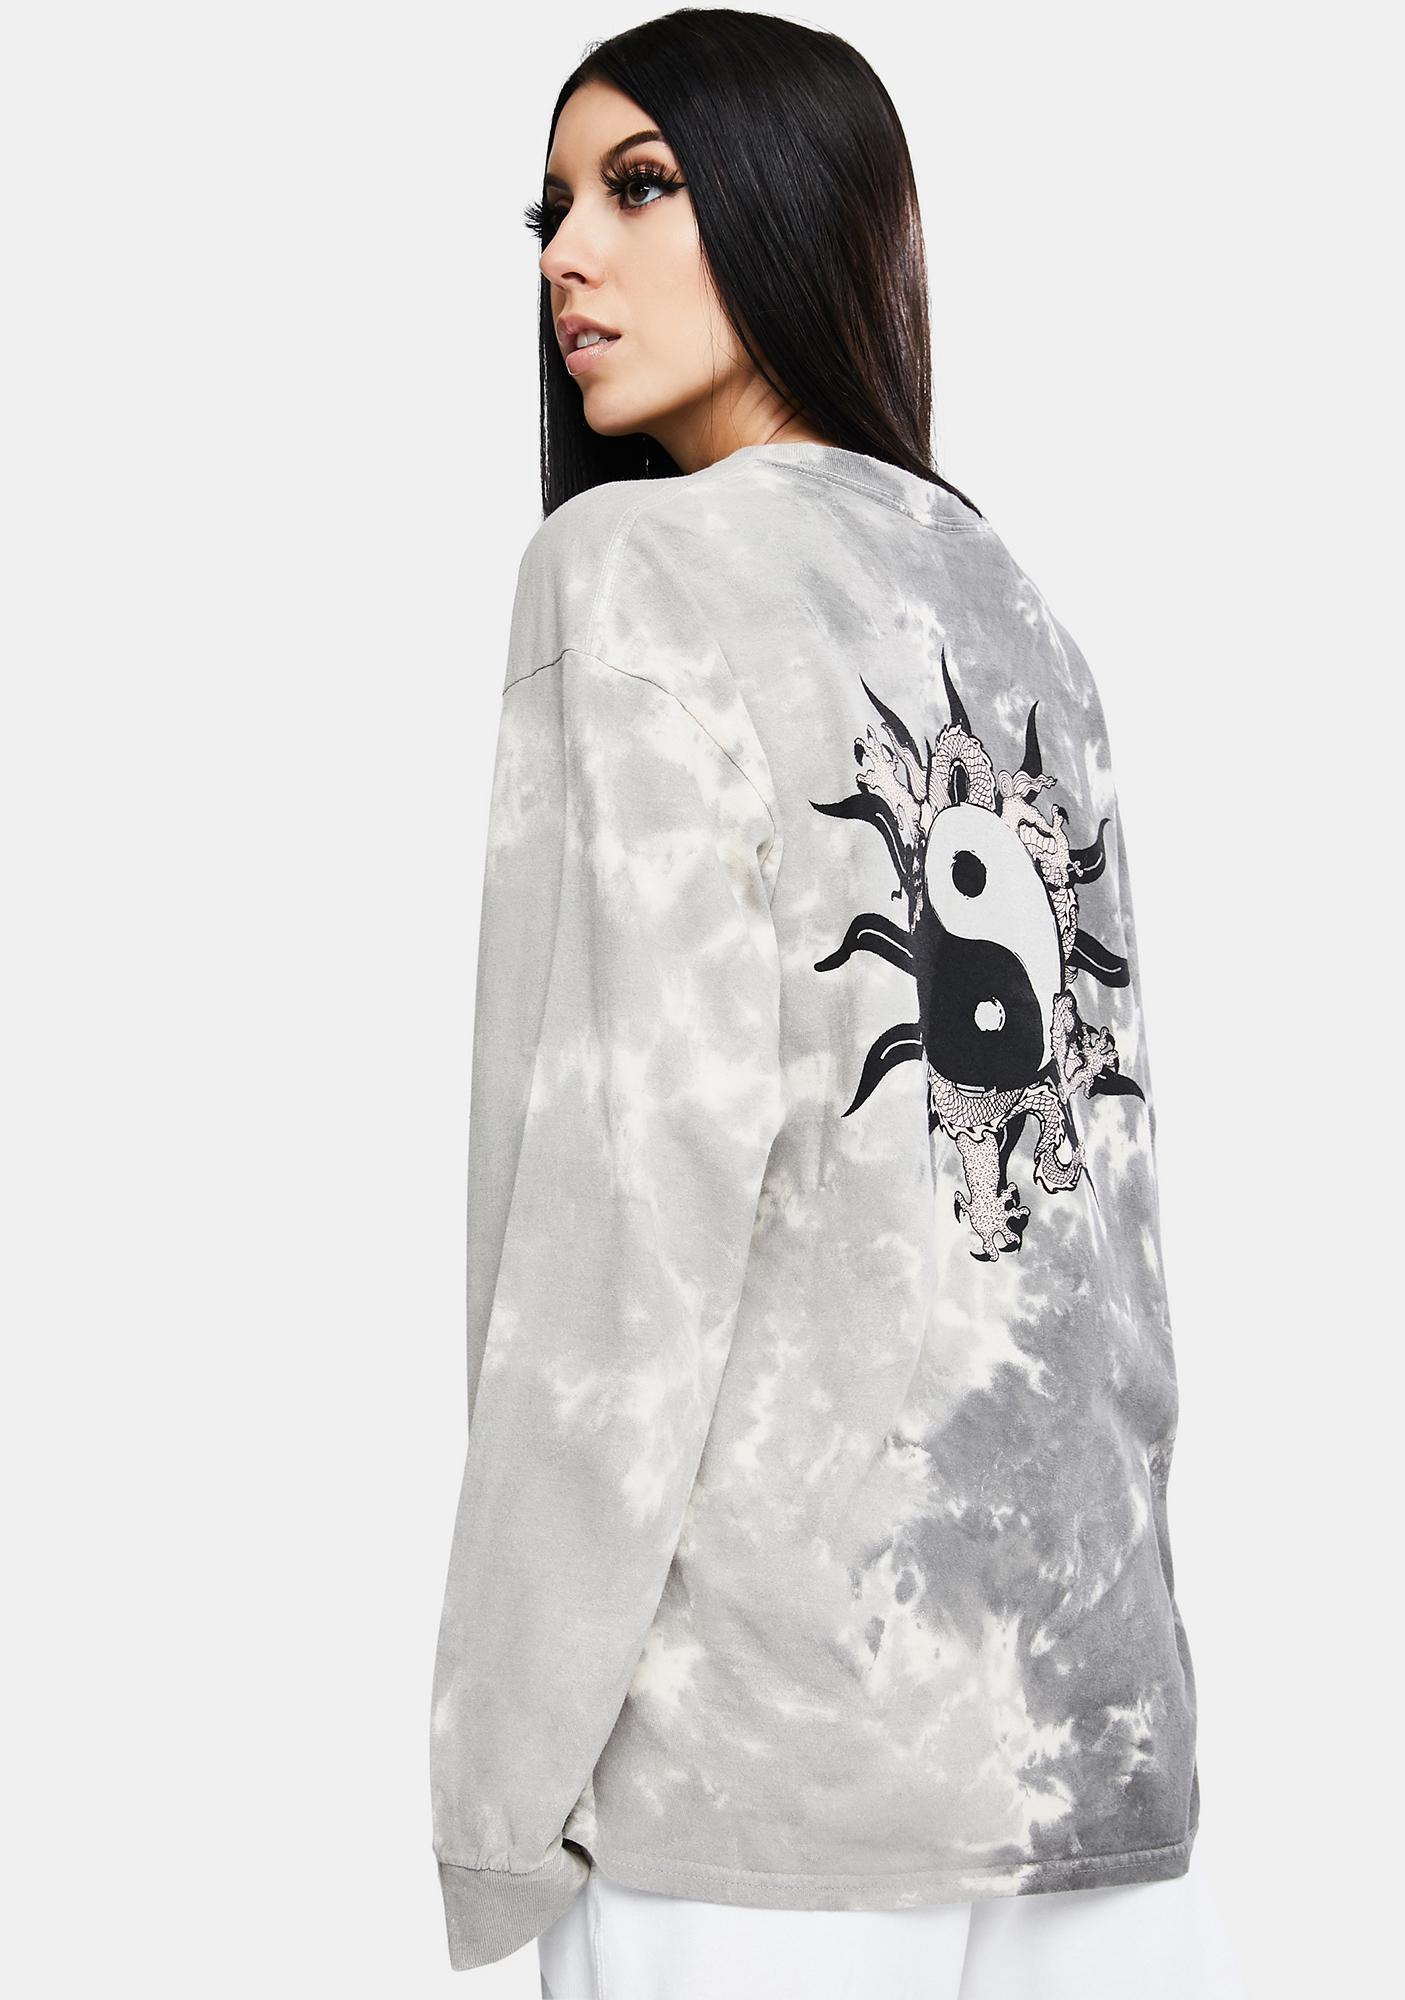 BDG Yin Yang Tie Dye Graphic Tee